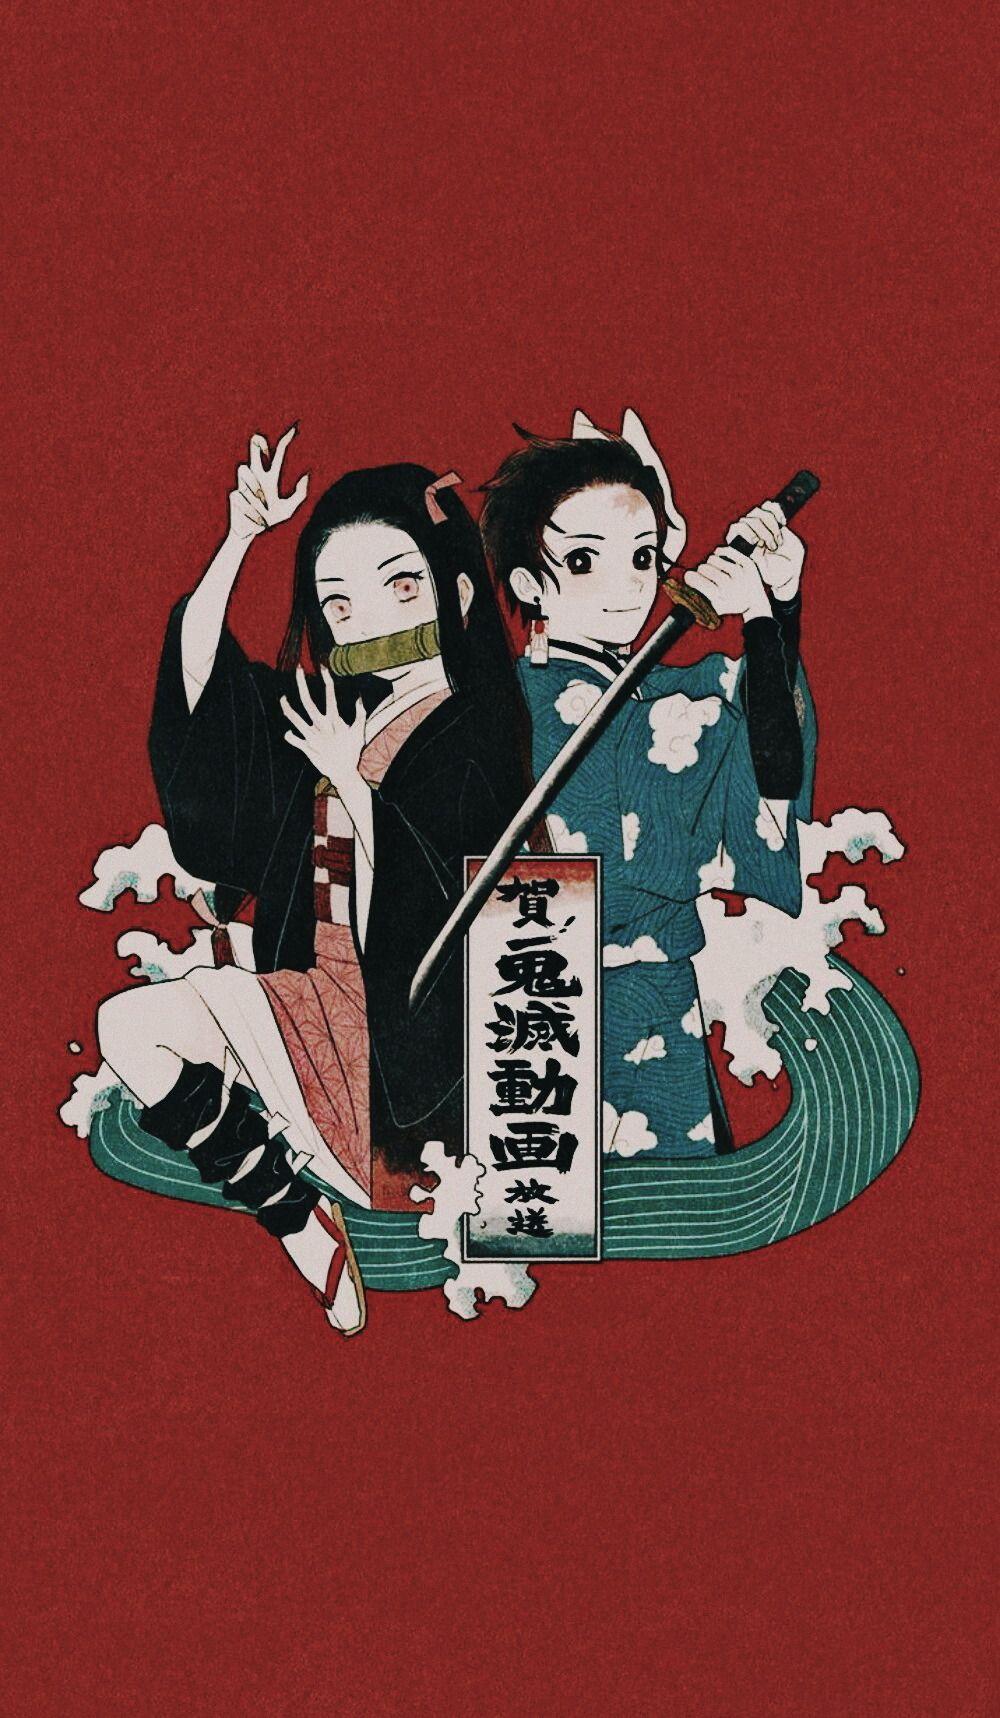 Kimetsu No Yaiba Wallpaper 4k For Phone Cool wallpapers